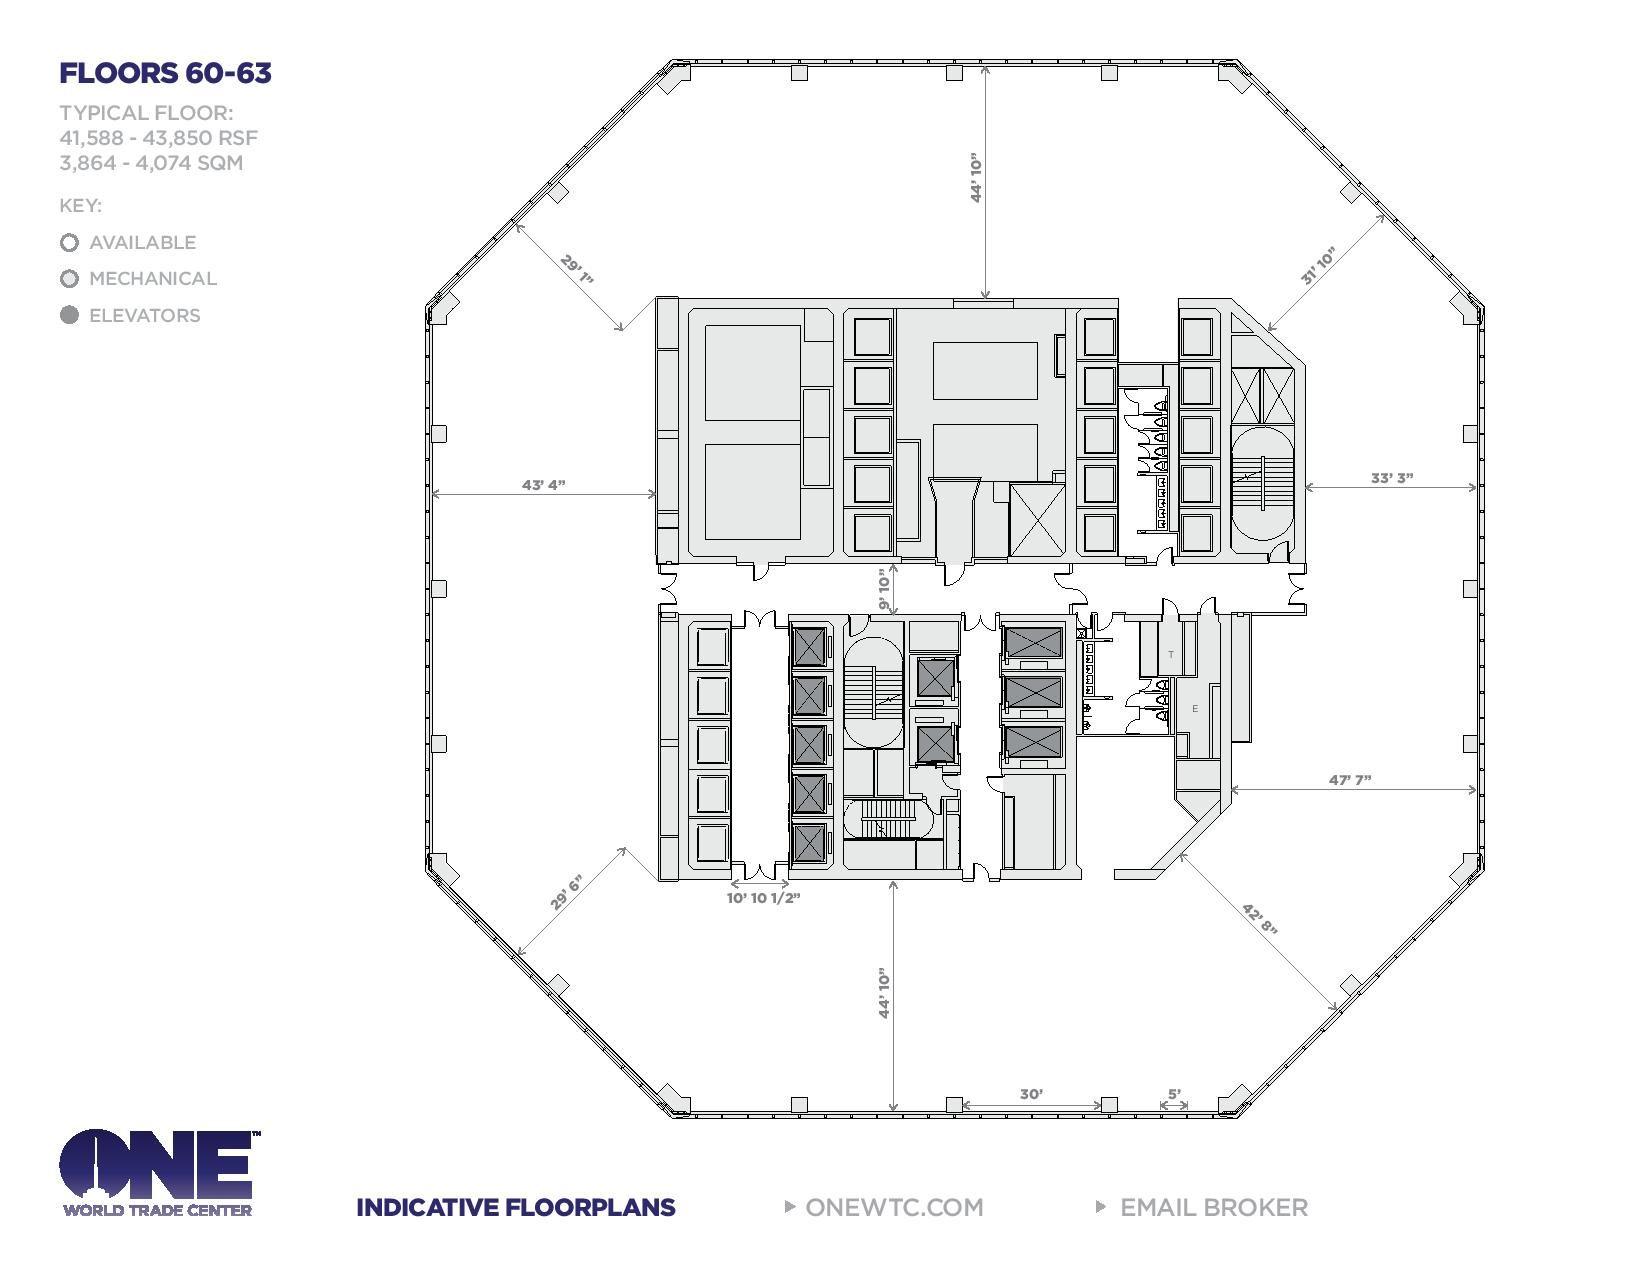 One World Trade Center, Freedom Tower Floor Plans, New York City